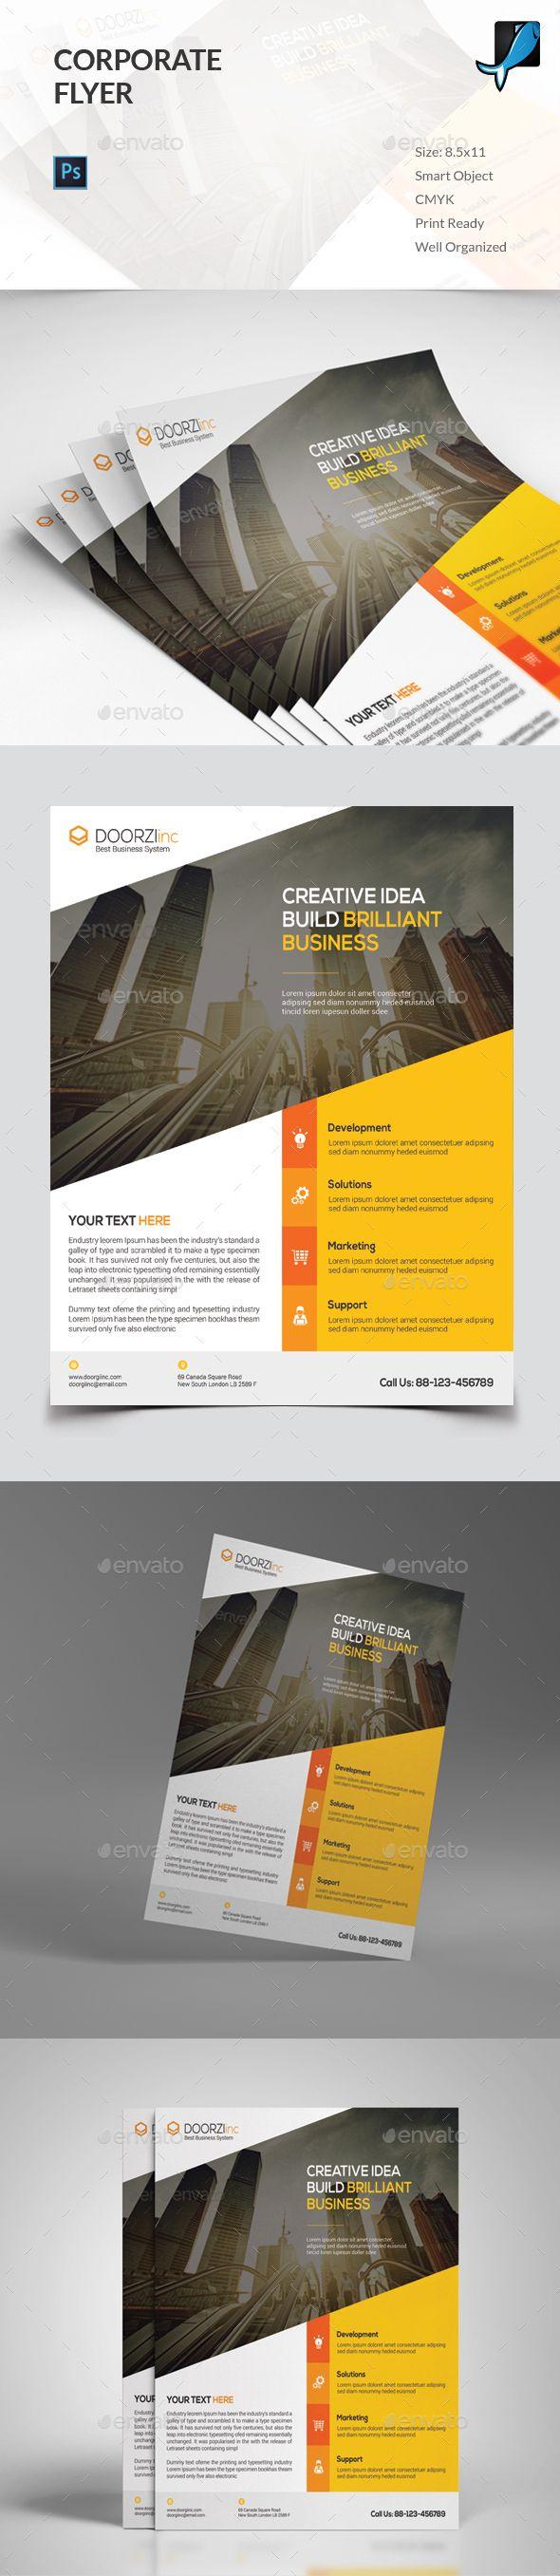 Corporate Flyer Template PSD #design Download: http://graphicriver.net/item/corporate-flyer/13578914?ref=ksioks